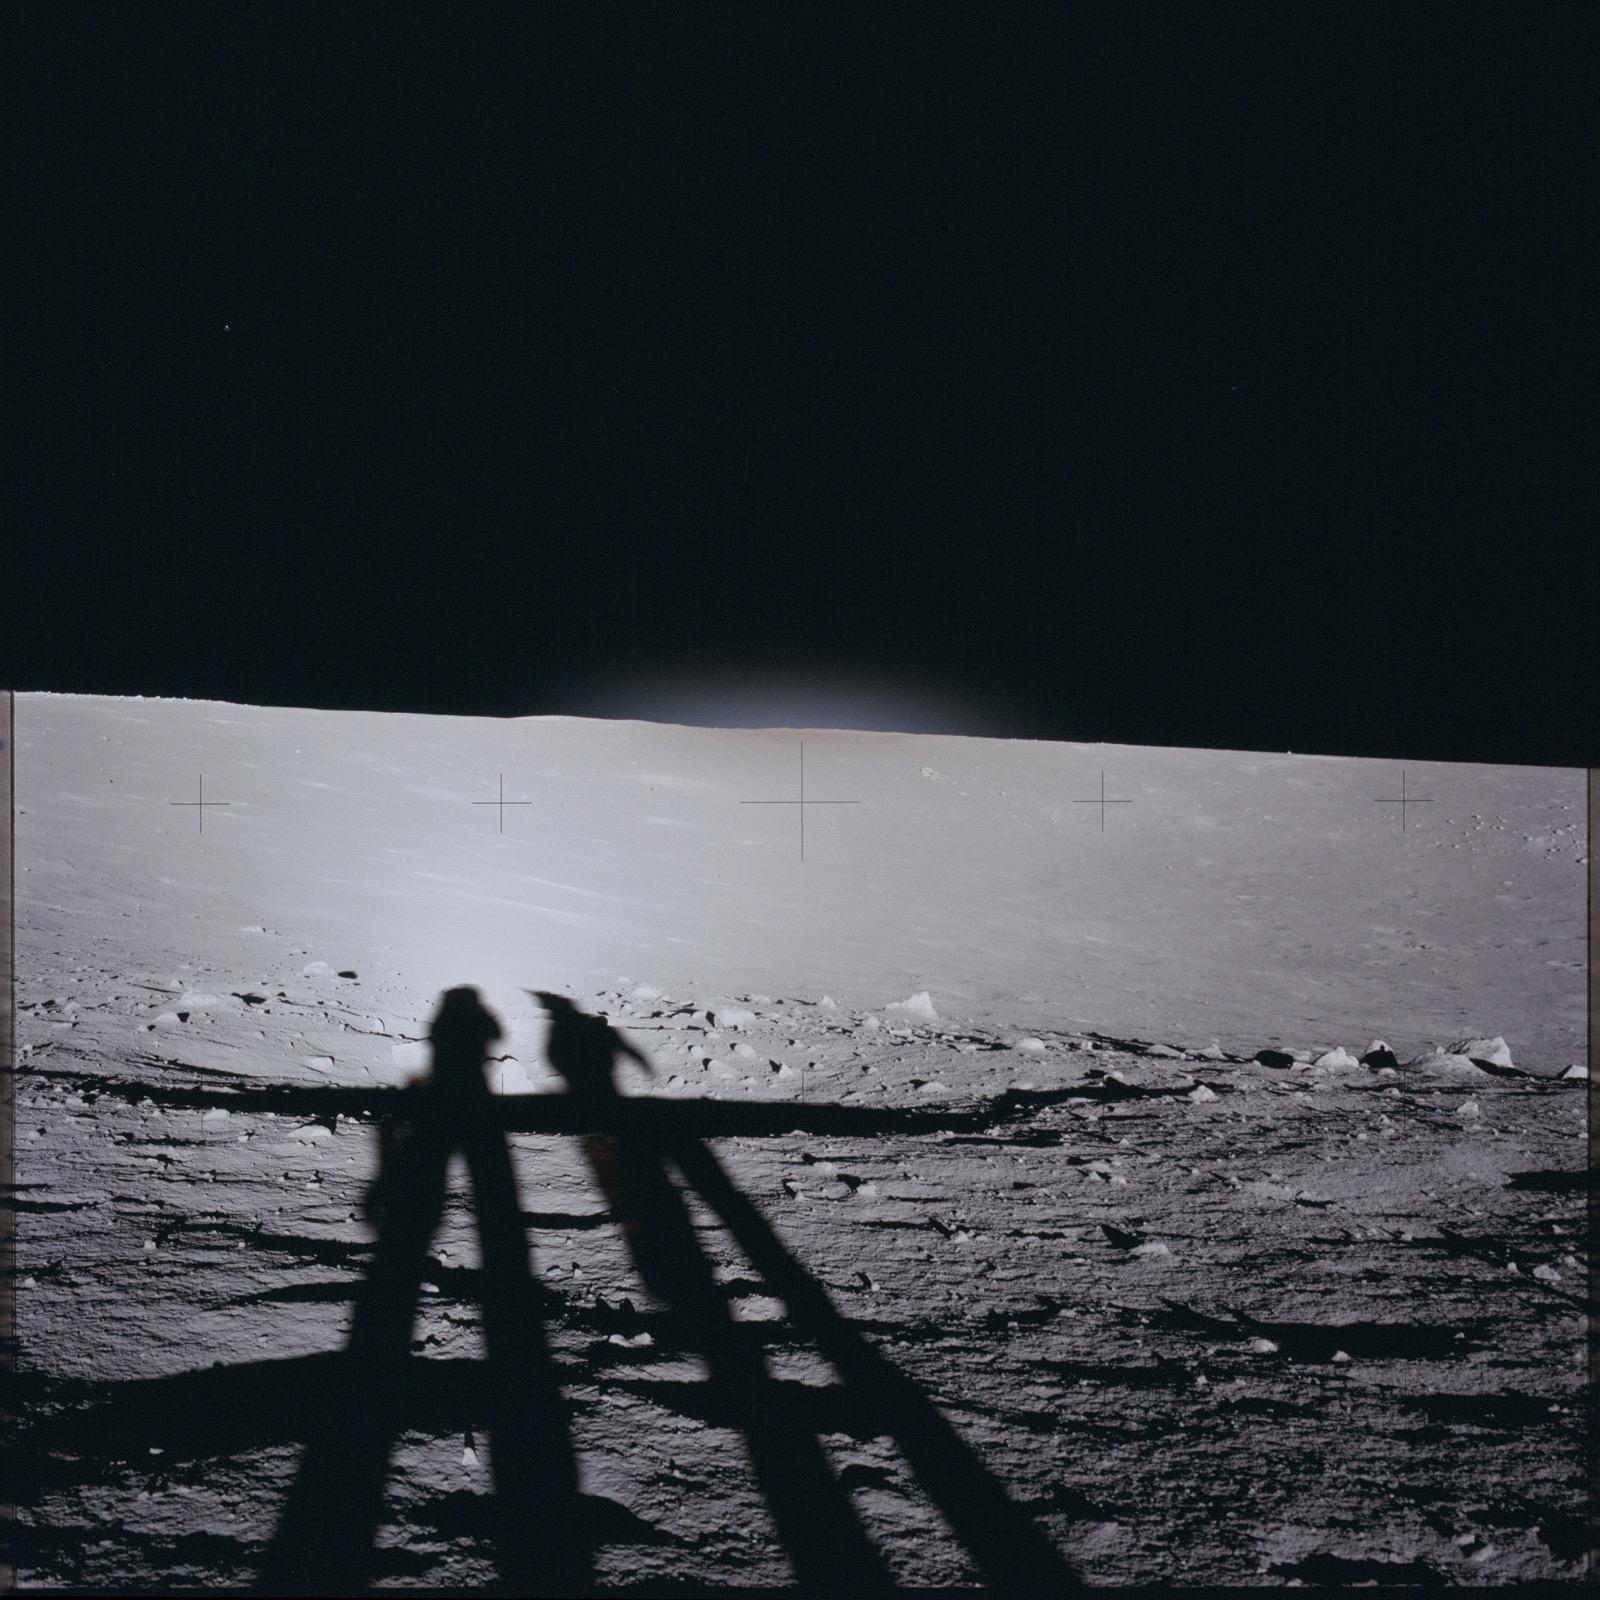 Apollo 12 Hasselblad image from film magazine 46/Y - EVA-1. NASA Photo